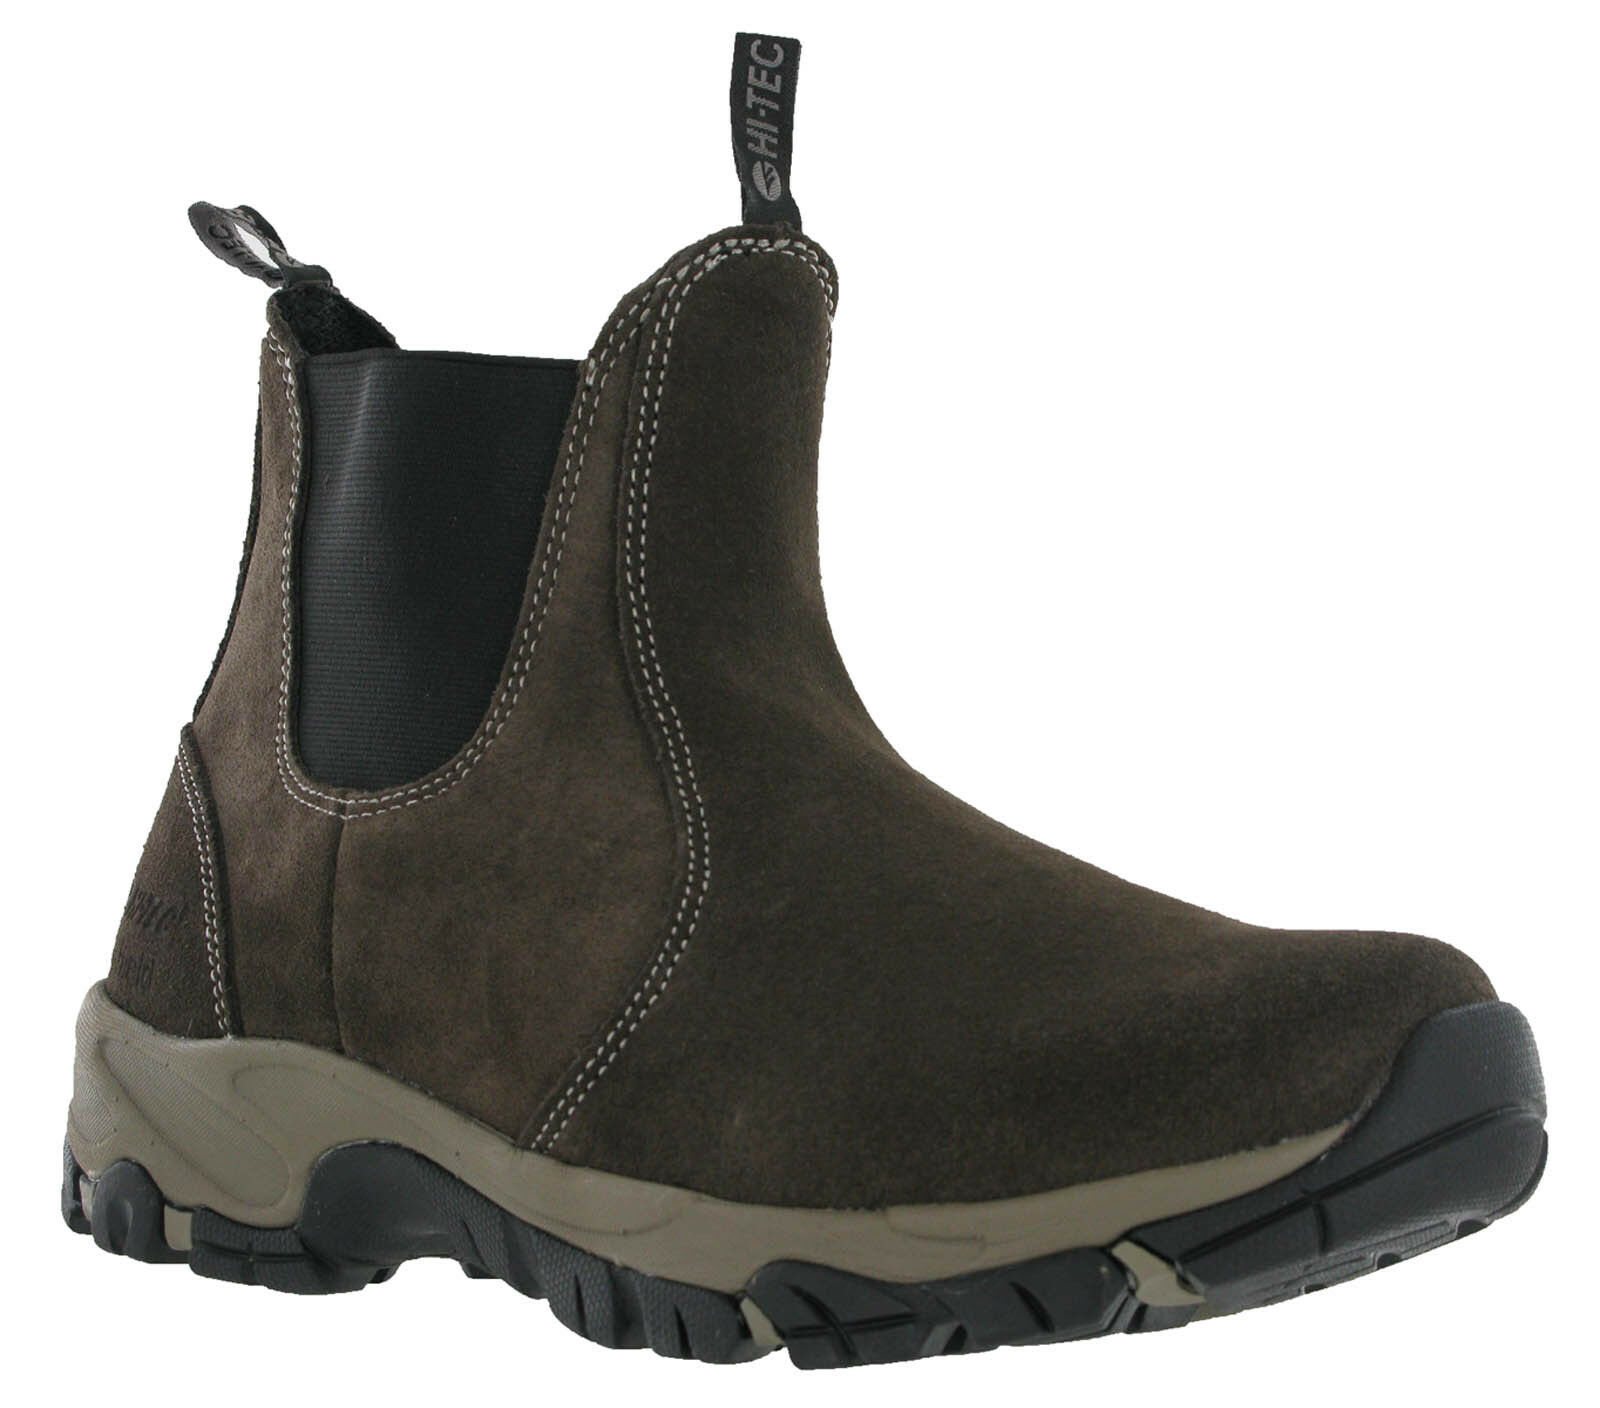 Hi-Tec Altitude Chelsea Lite Gamuza Ligero botas De Hombre Doble Fuelle Caminar